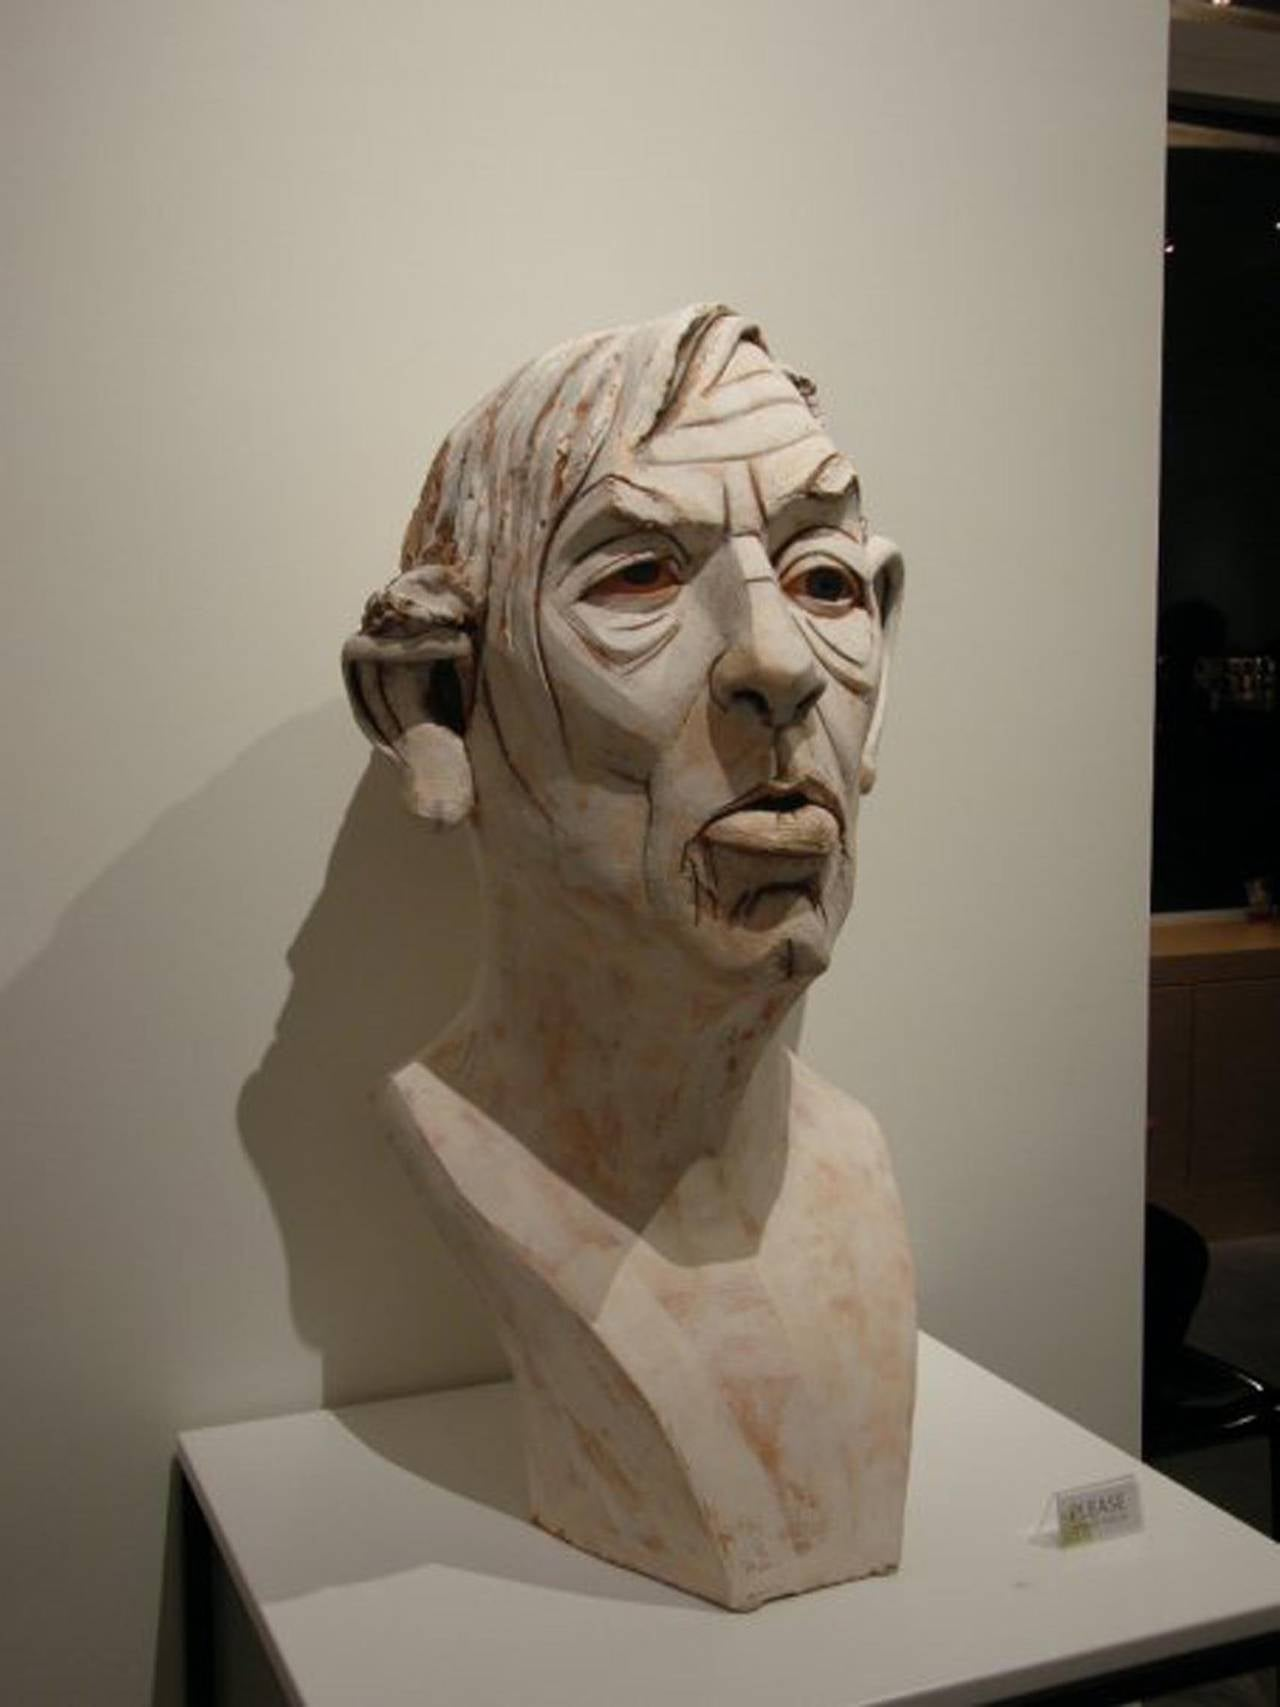 Large Terracotta Sculpture Titled: Albert - Beige Figurative Sculpture by Chris Riccardo